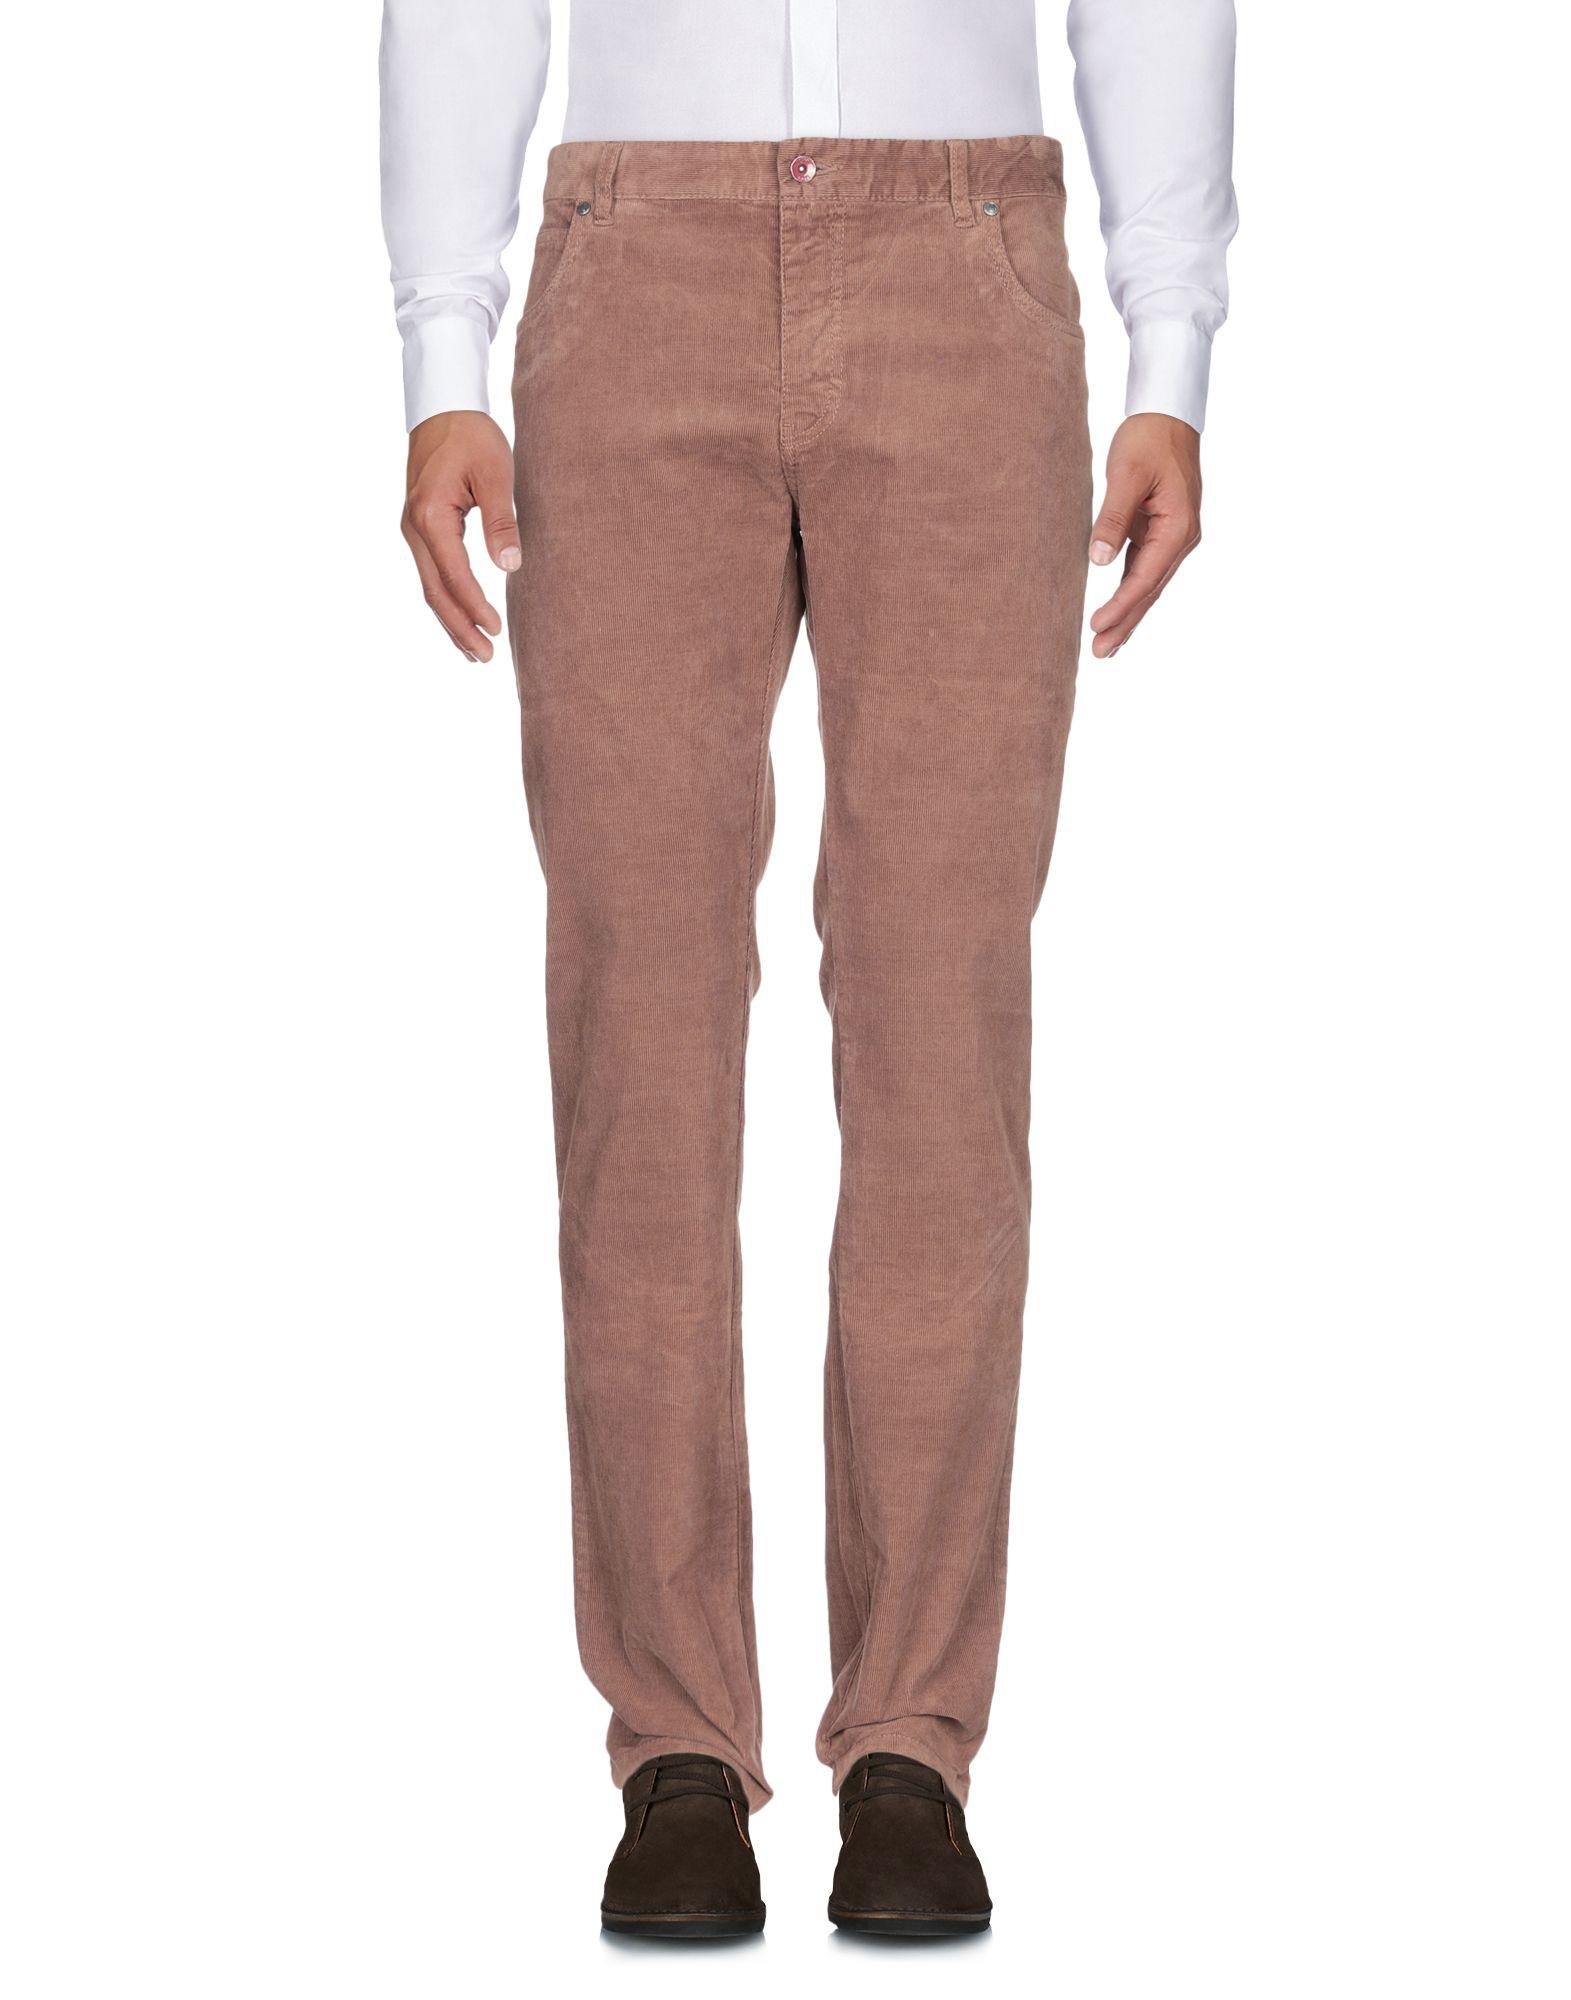 MAISON BRAVE Повседневные брюки maison brave костюм